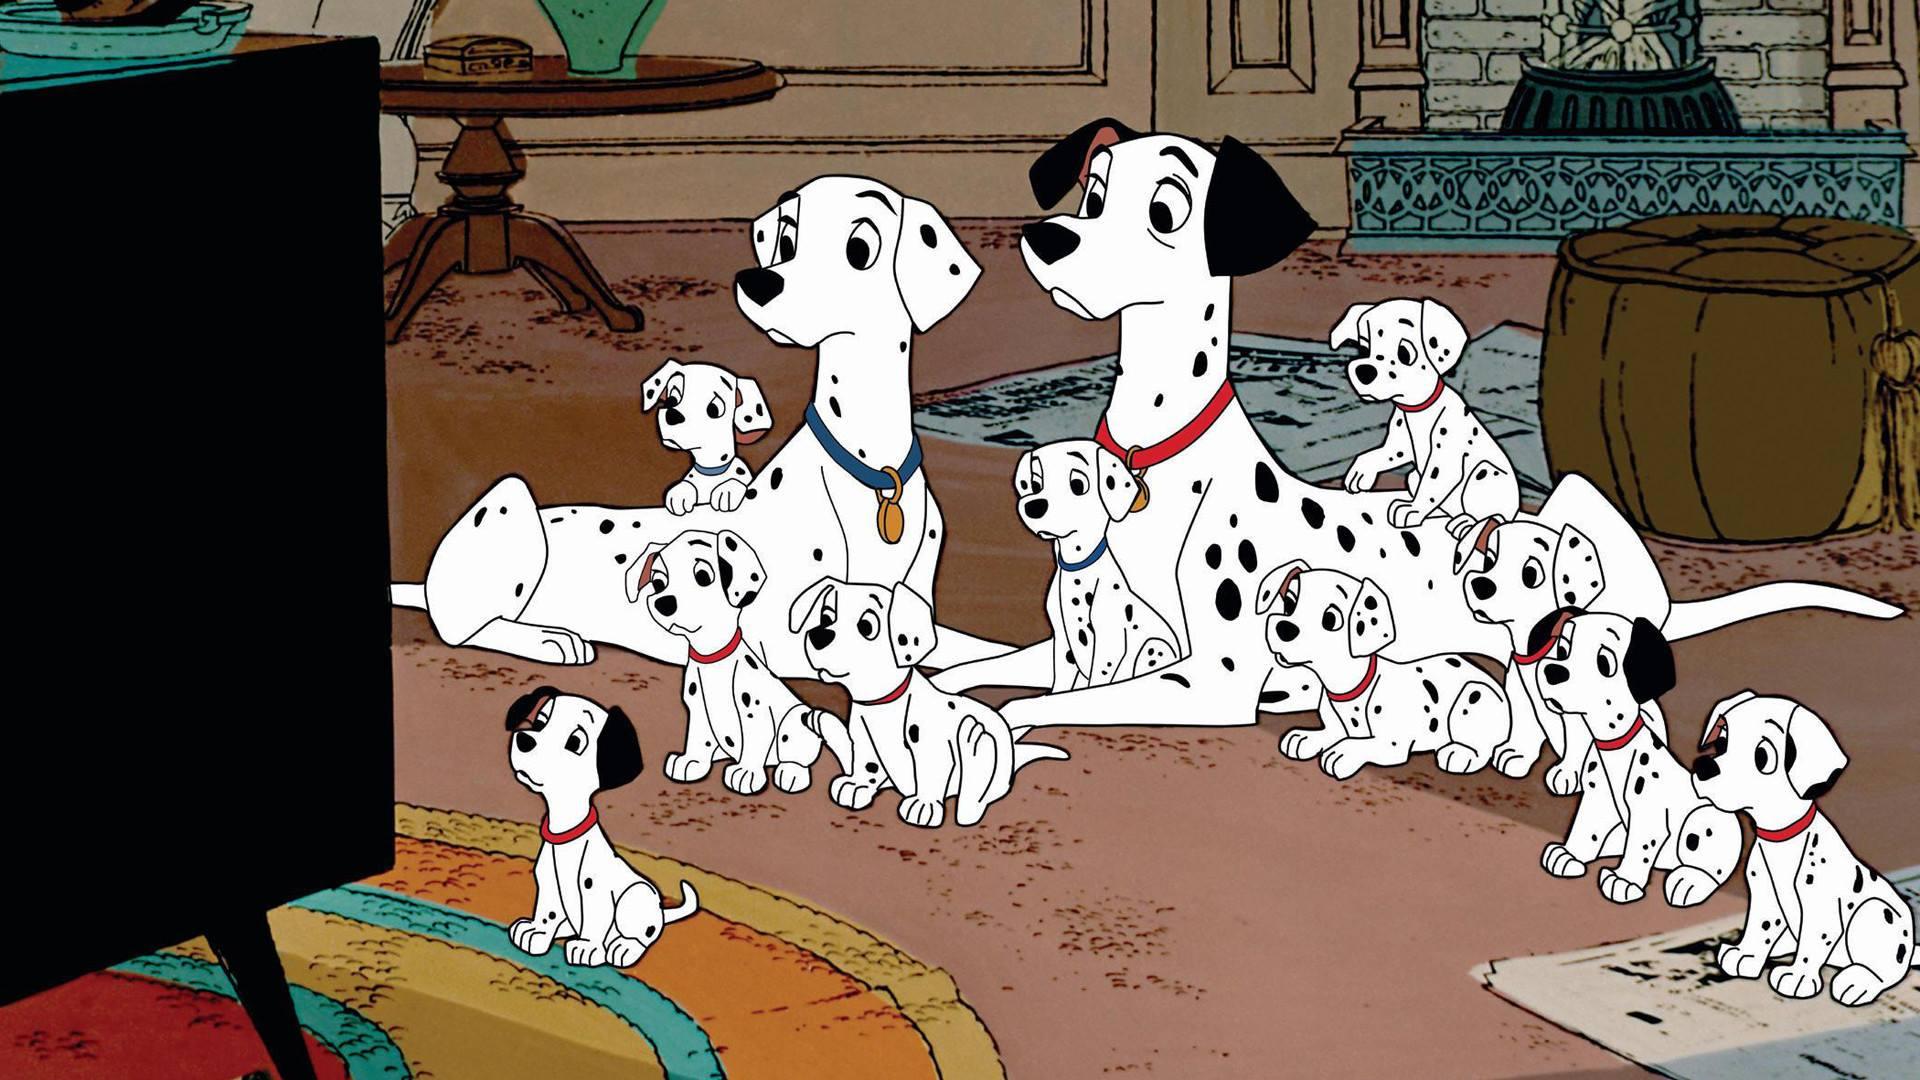 101 Dalmatians, dalmatian,dogs, purebred dogs, movies, Disney